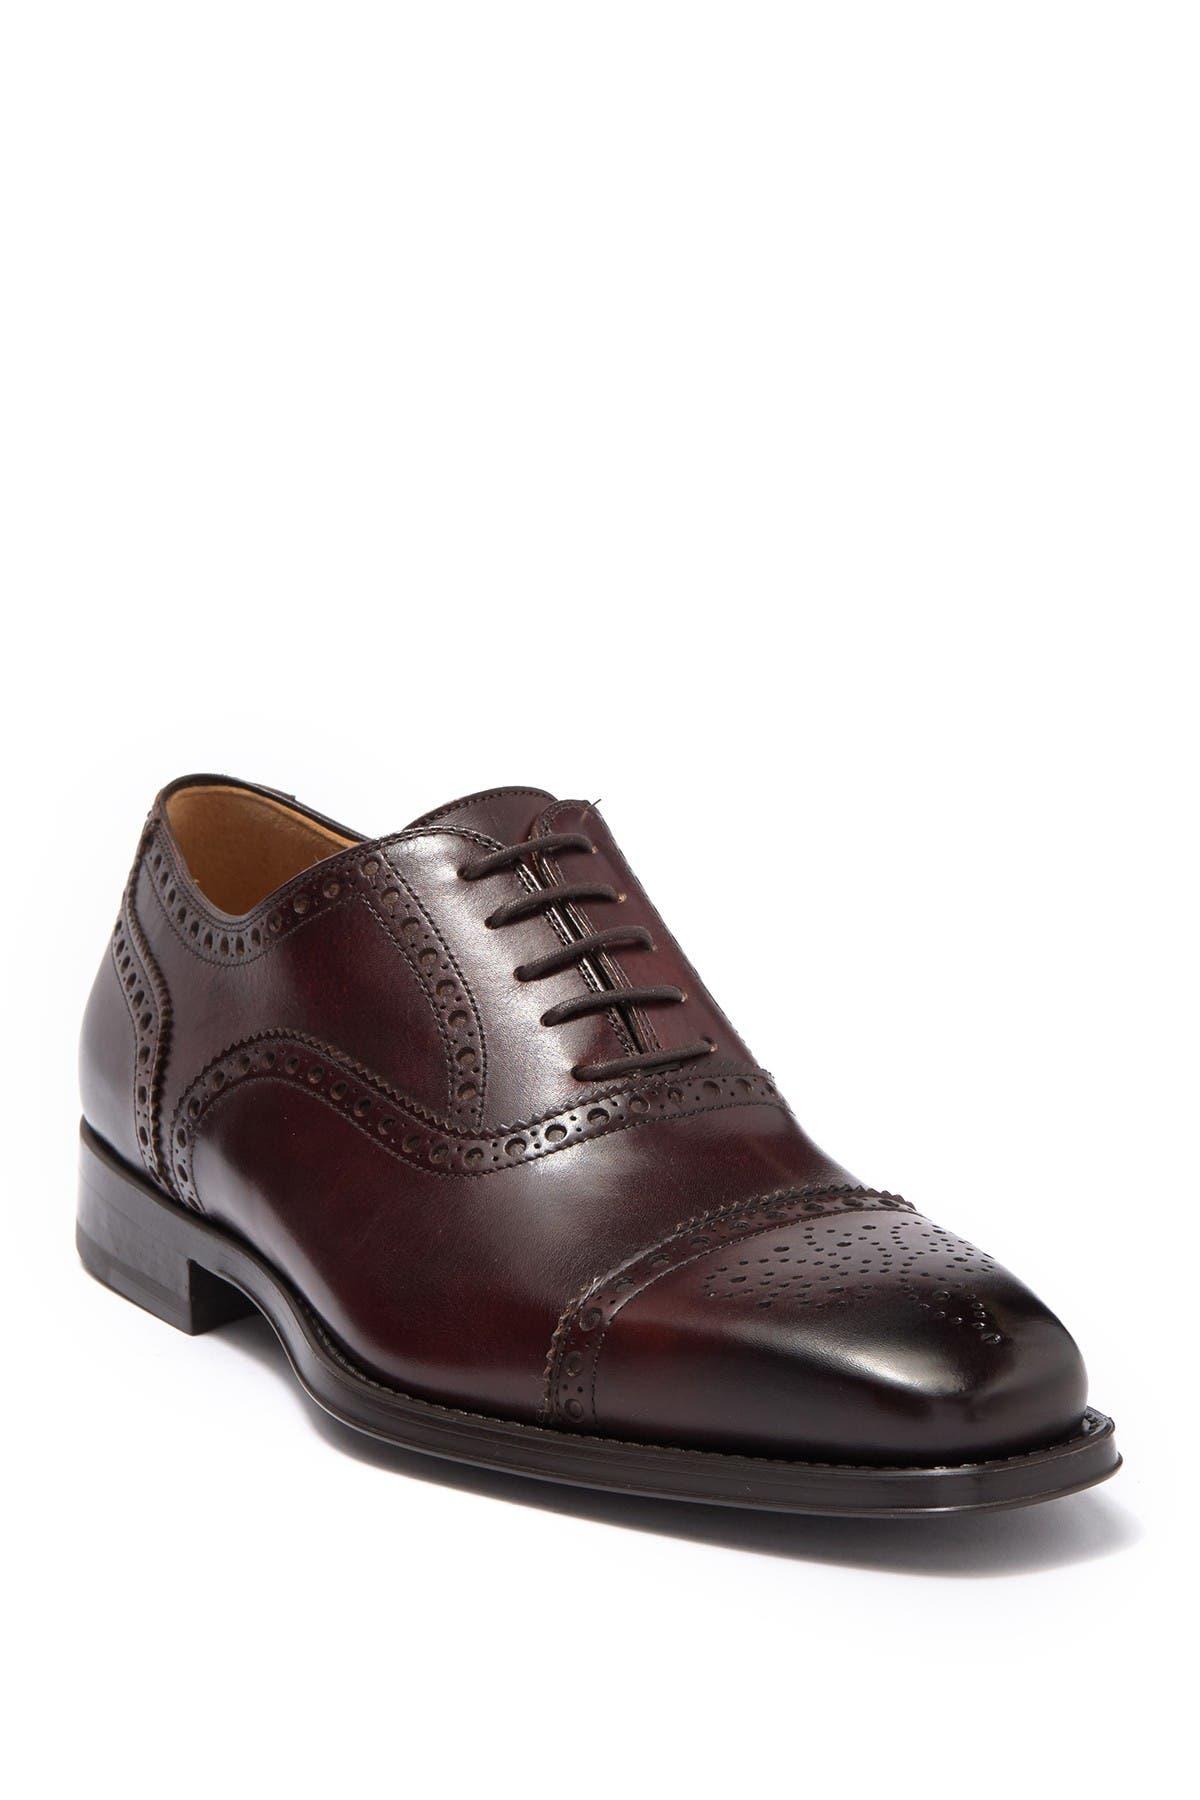 Image of Magnanni Cieza Leather Brogue Oxford